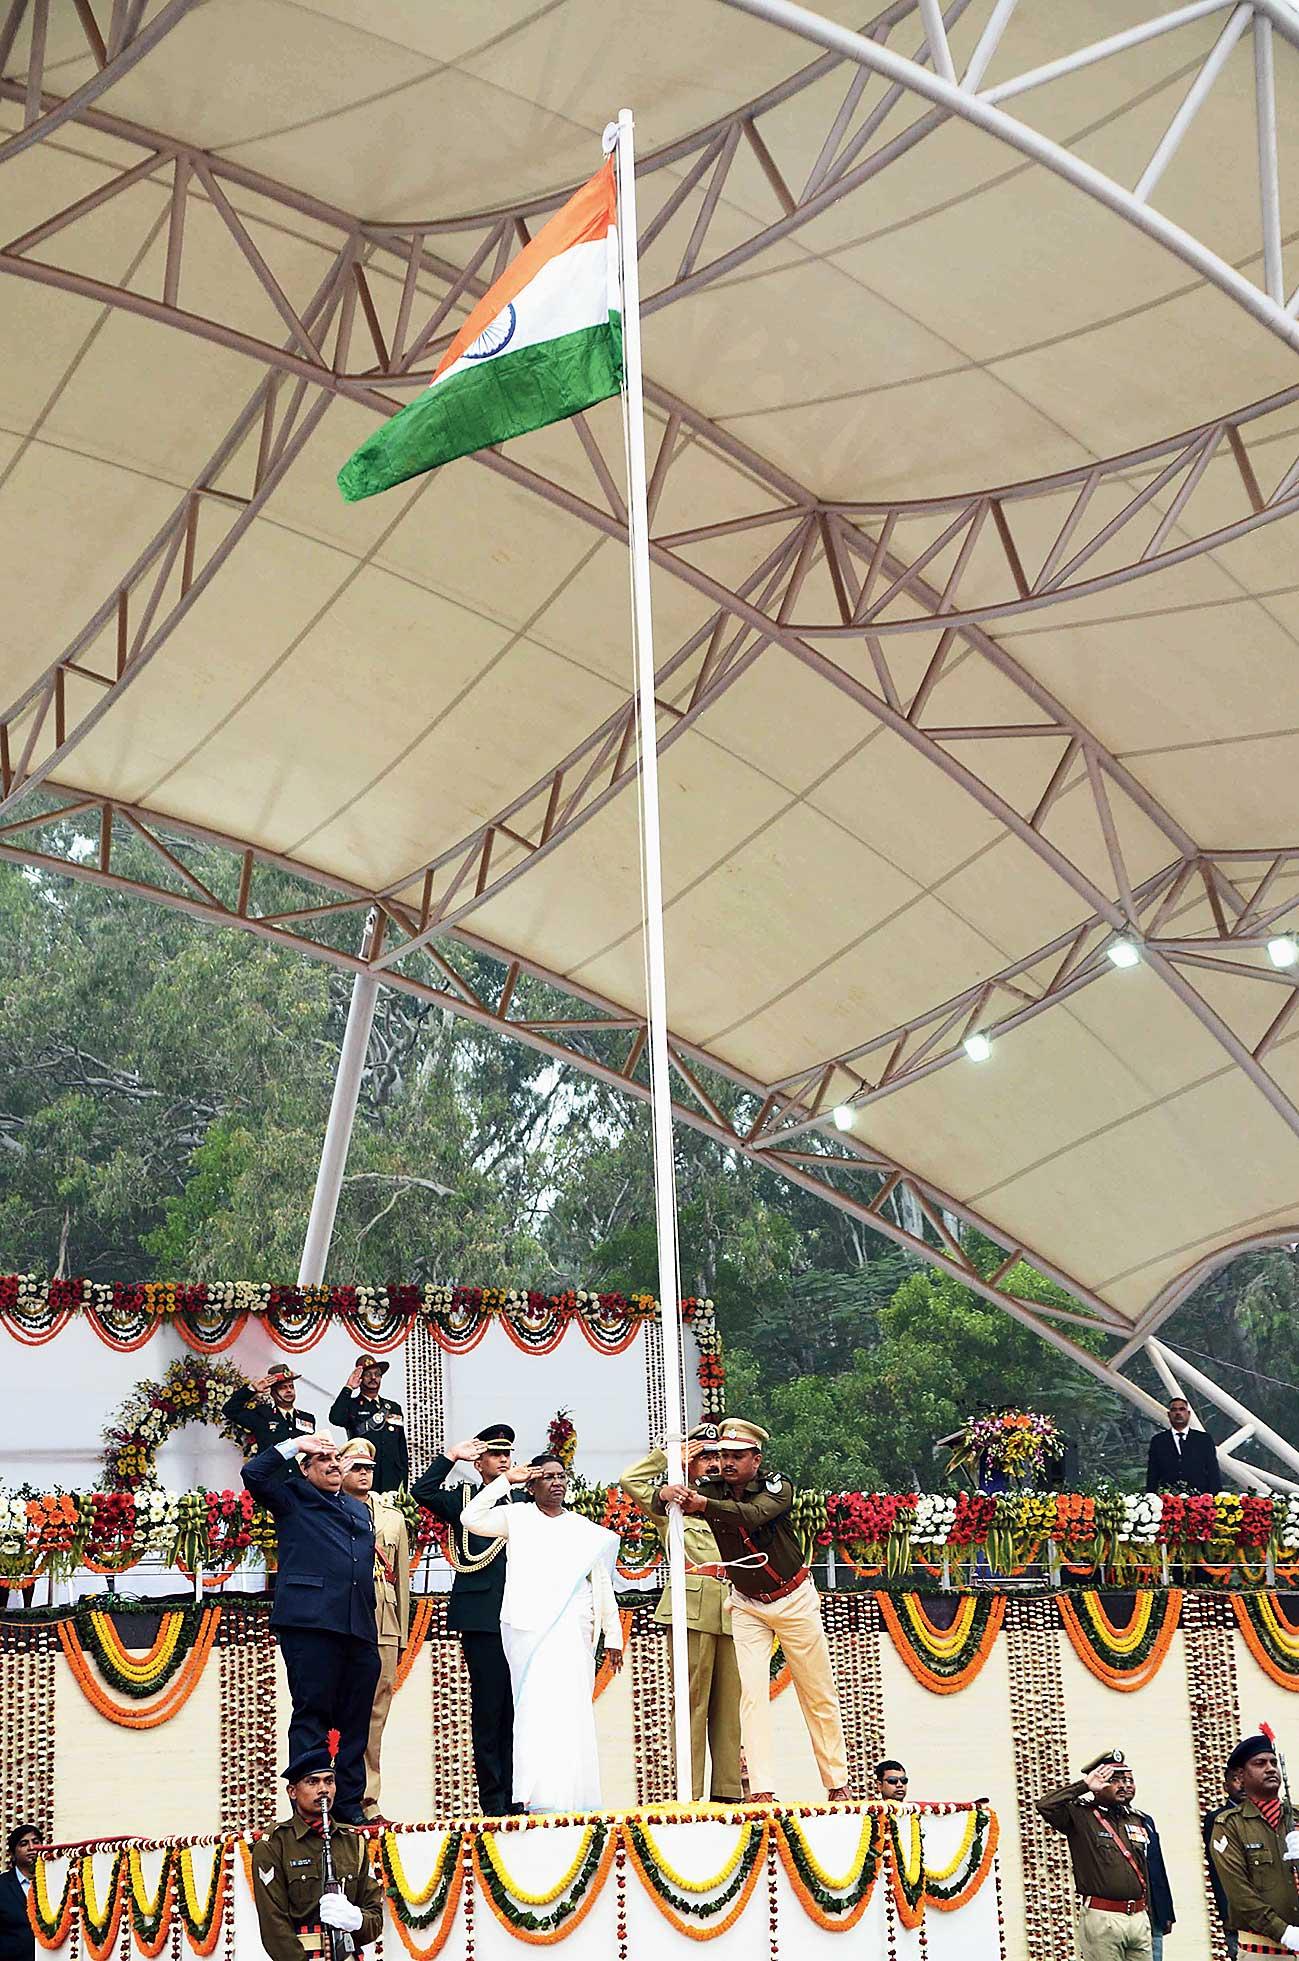 Governor Droupadi Murmu, along with chief secretary Sudhir Tripathi and DGP DK Pandey, salutes the Tricolour at Morabadi in Ranchi on Saturday.